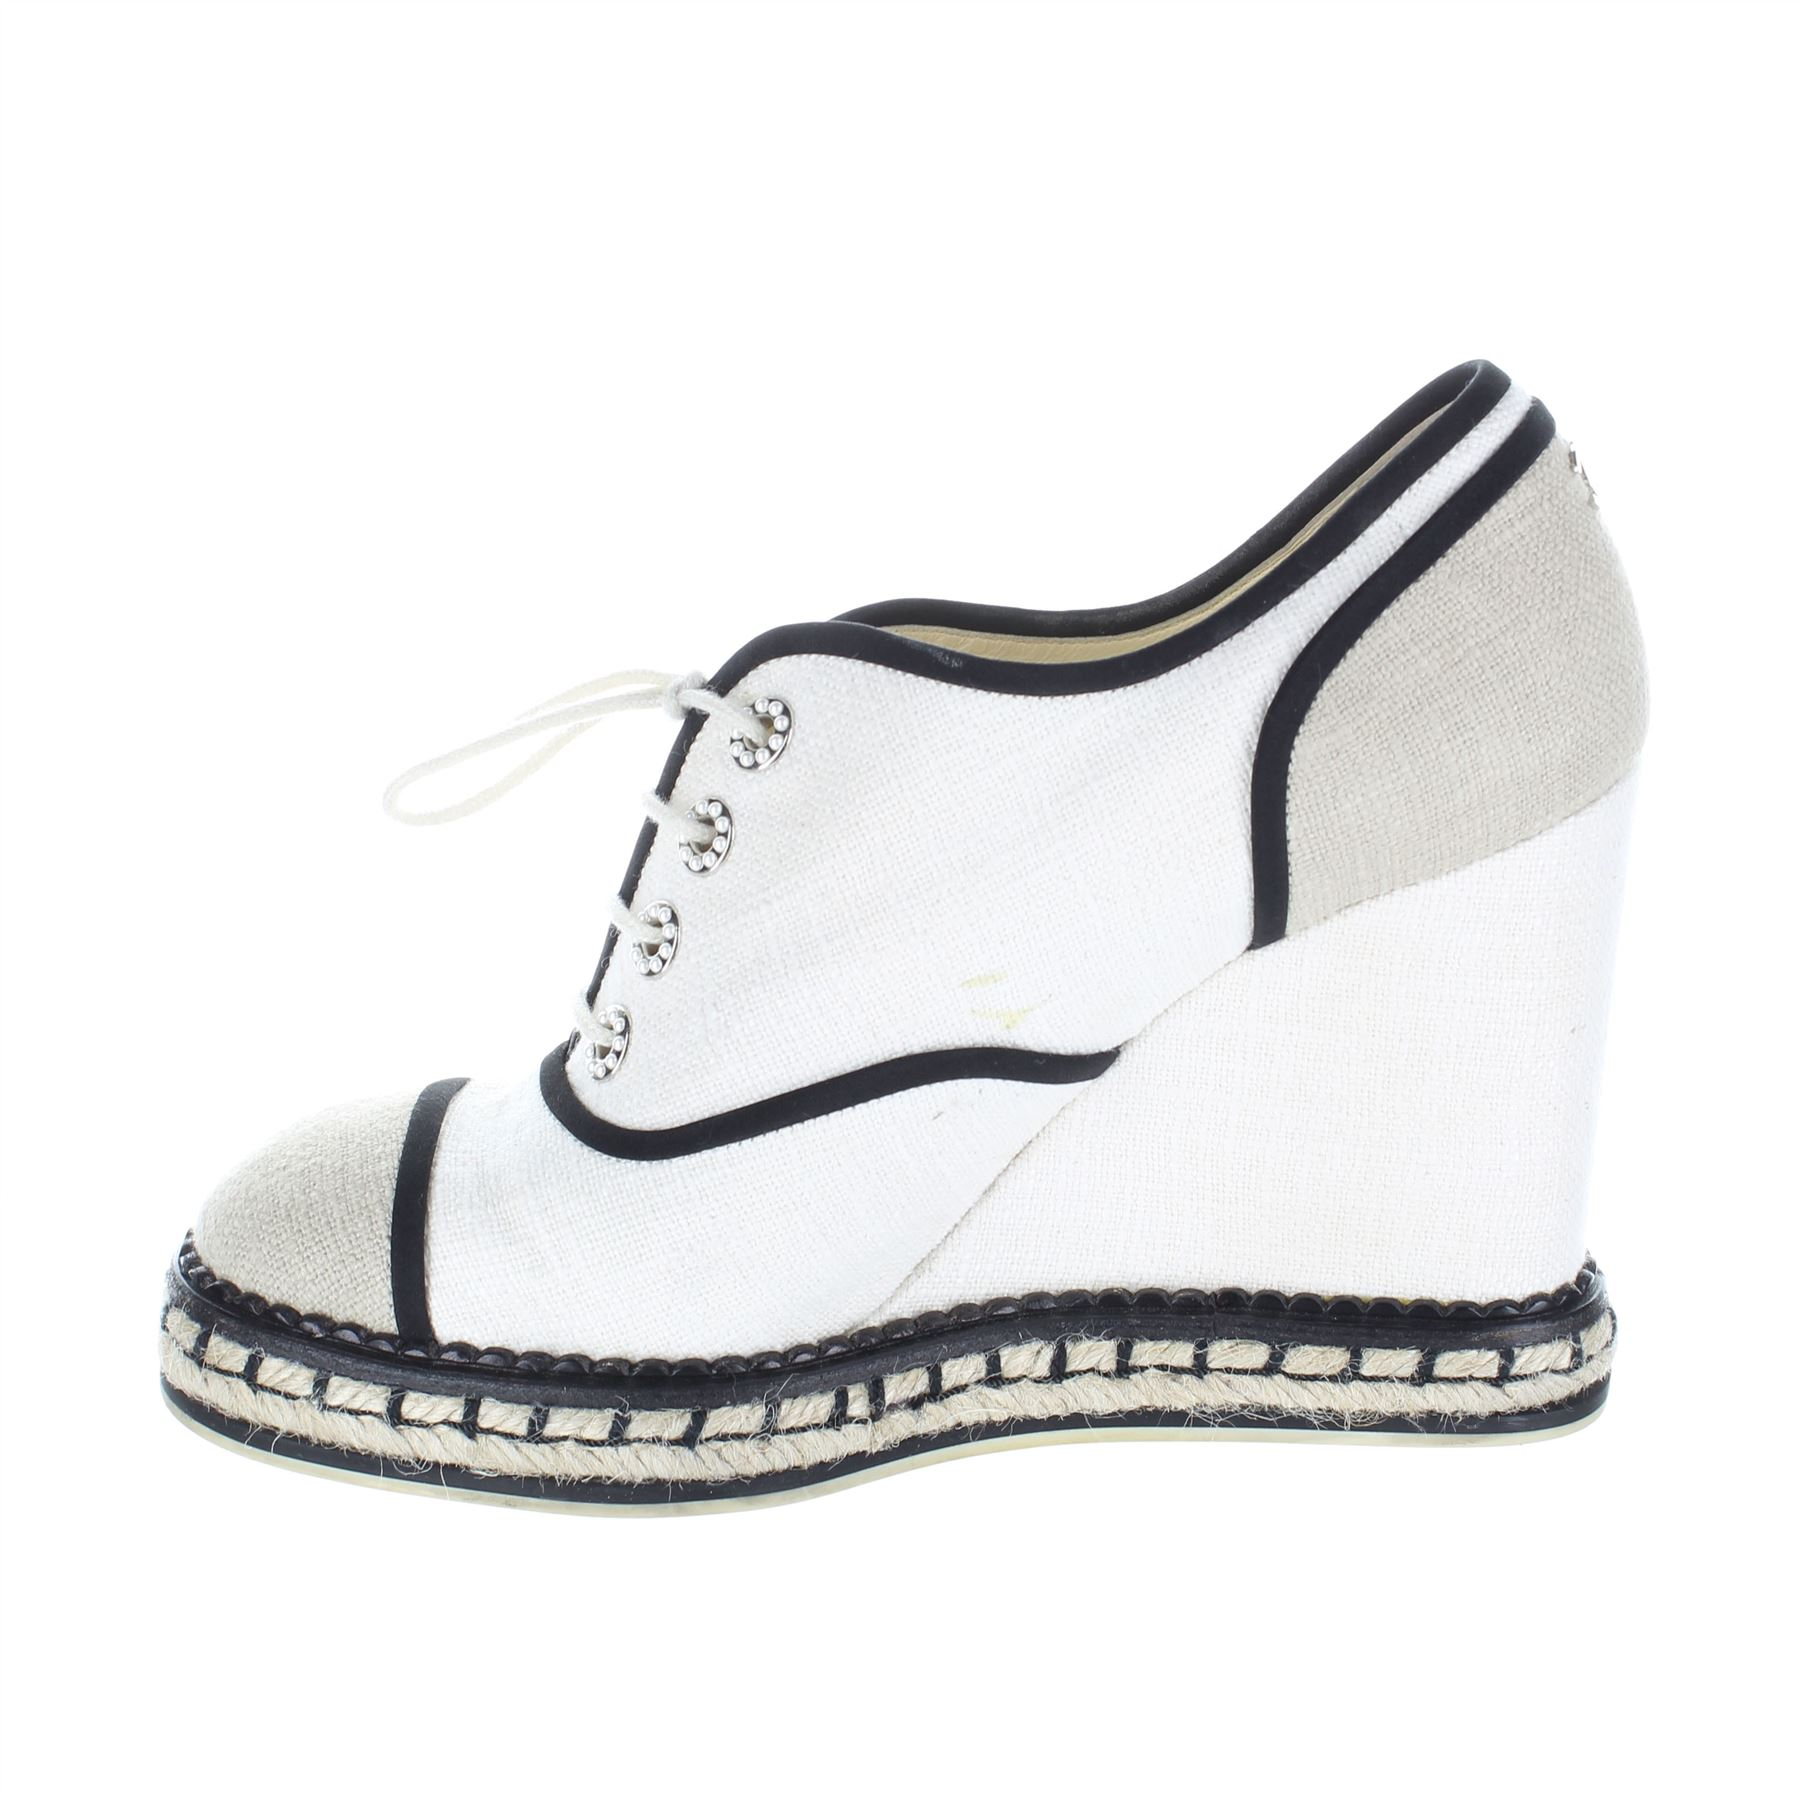 65b41ca304b CHANEL Beige Cloth Wedge Shoes